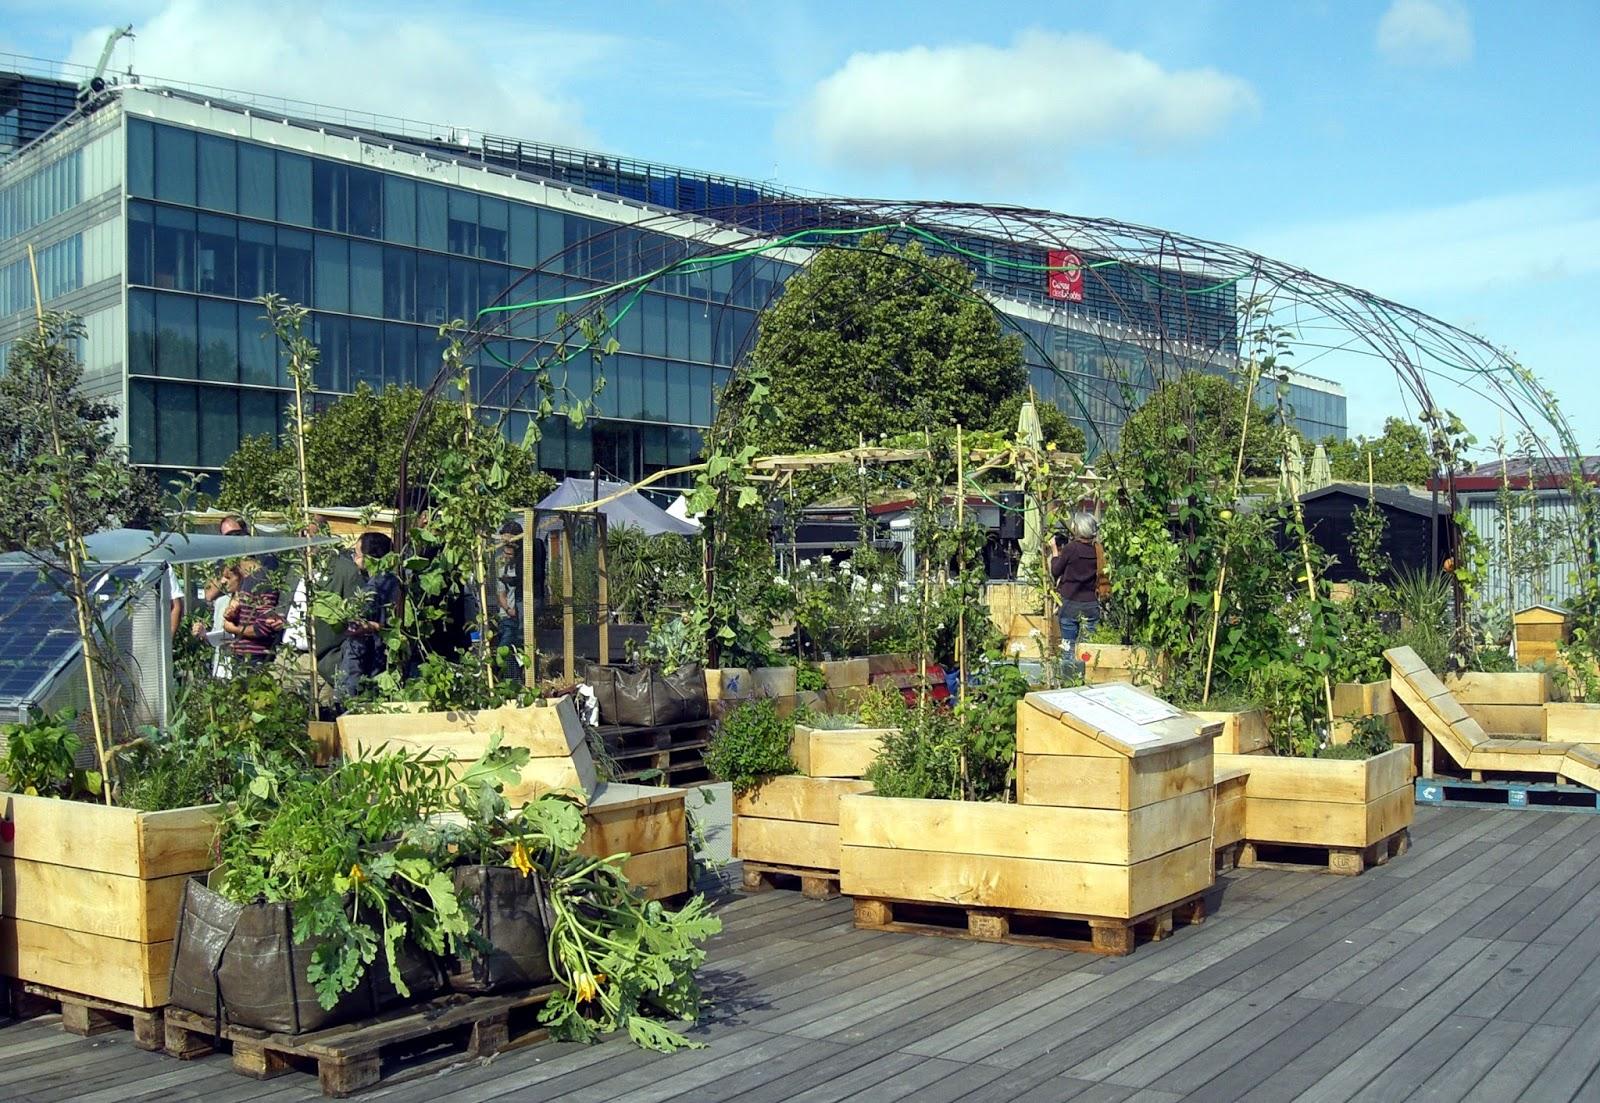 Living roof laboratoire d agriculture urbaine en bord de seine vergers urb - Agriculture urbaine paris ...